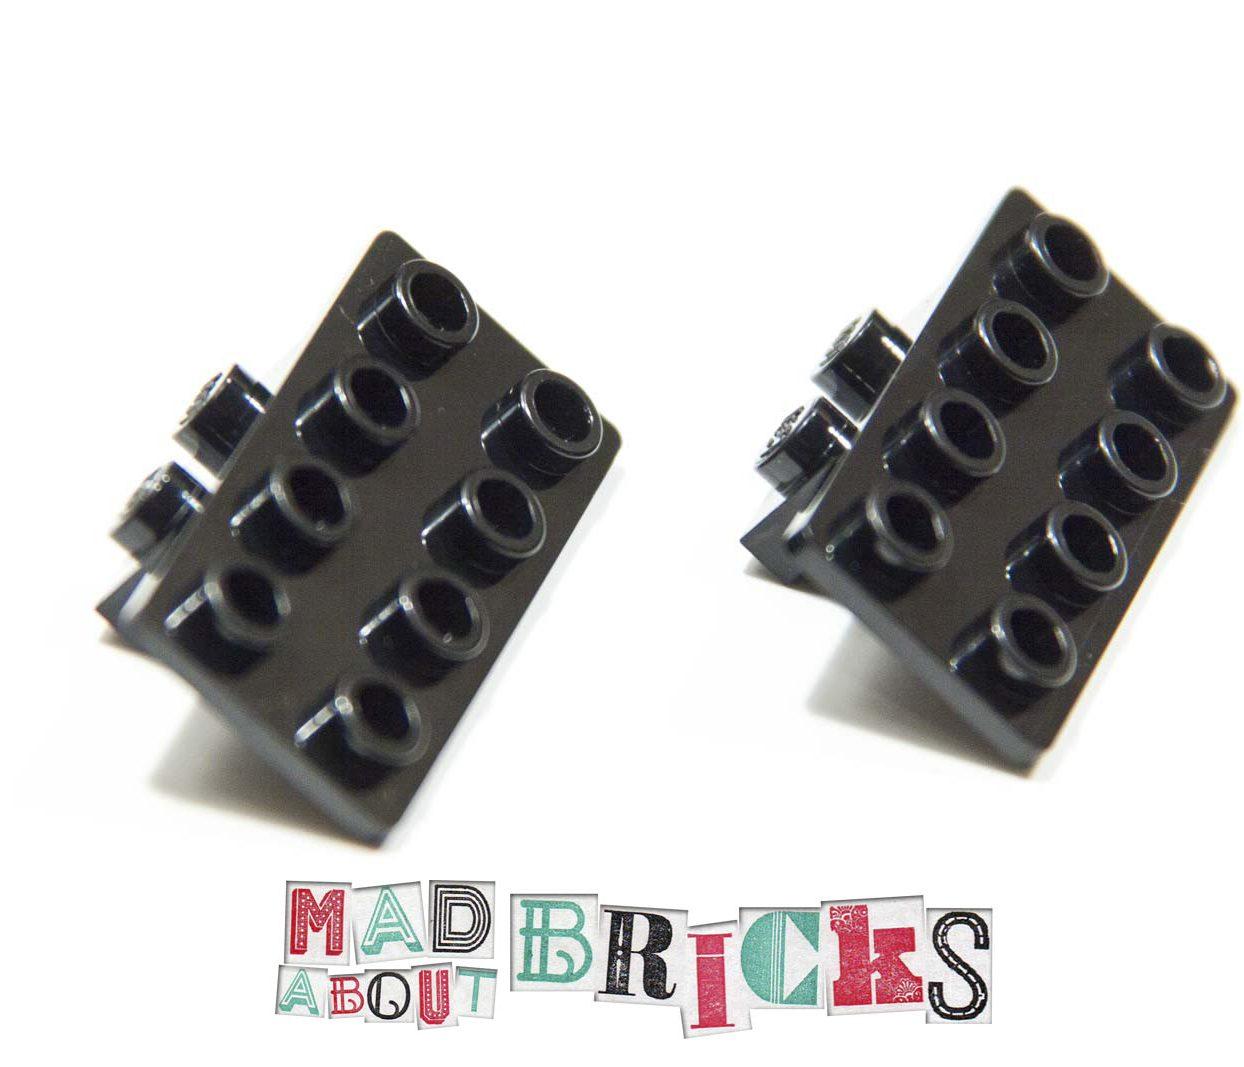 NEW Lego 93274 Black Angle Plate 1x2/2x4 4616245